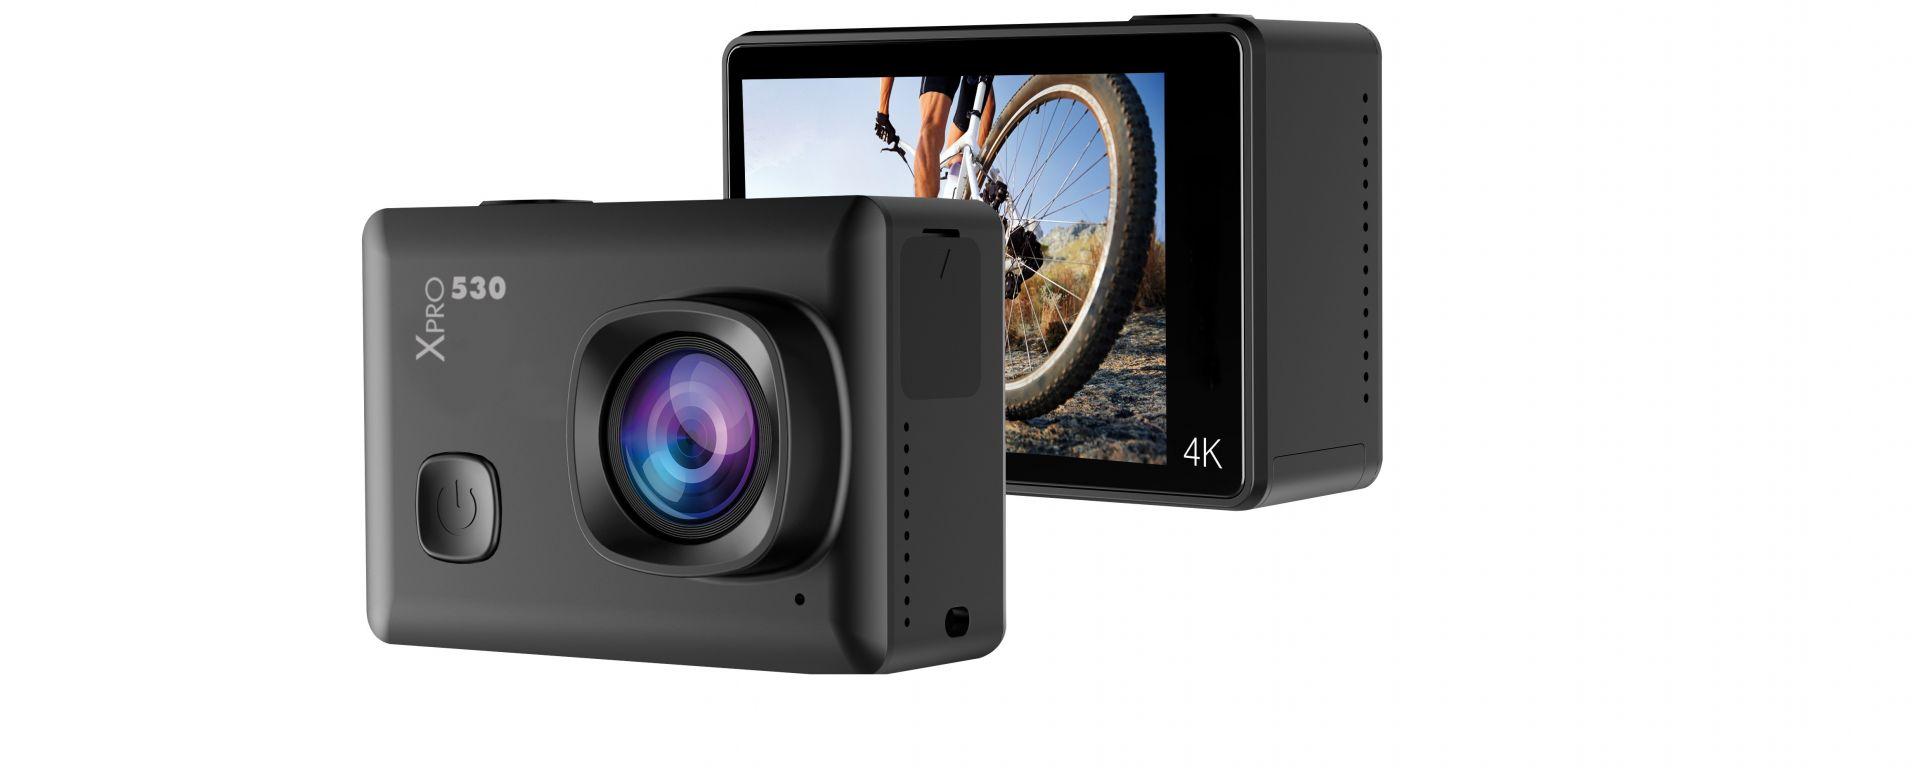 Mediacom SportCam Xpro 530 Wi-Fi: action cam 4K per tutti